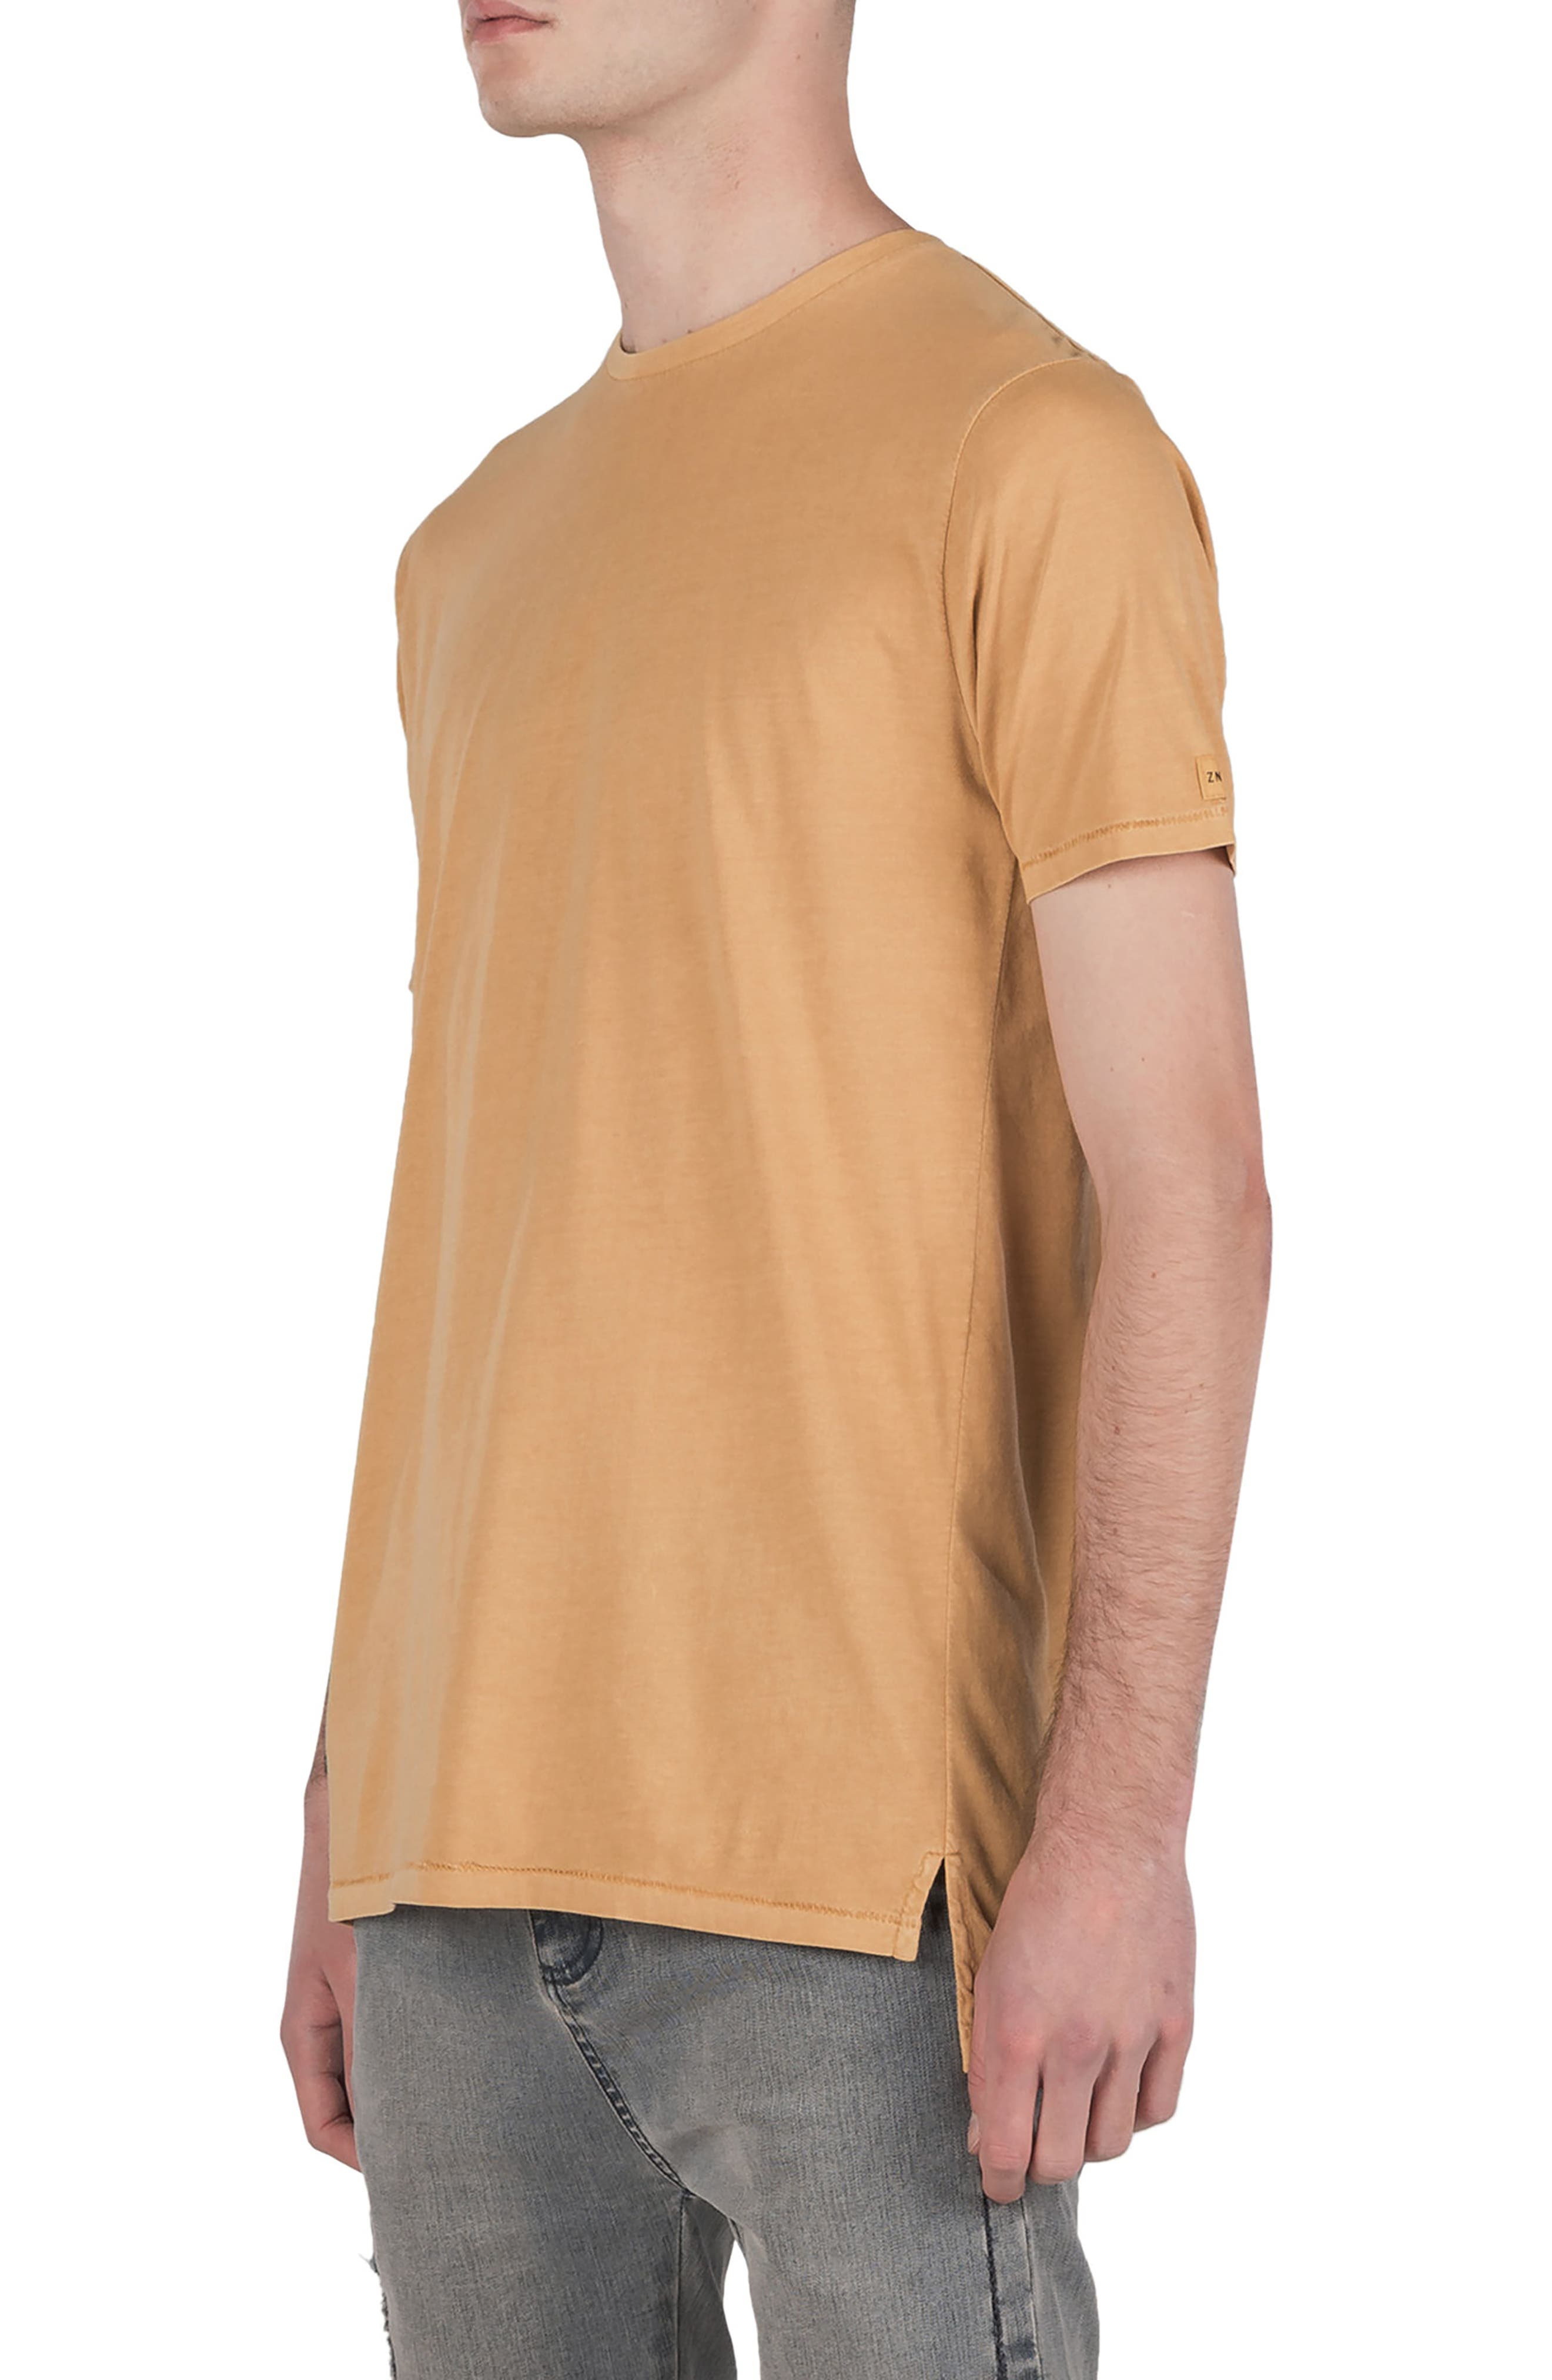 Flintlock T-Shirt,                             Alternate thumbnail 5, color,                             800